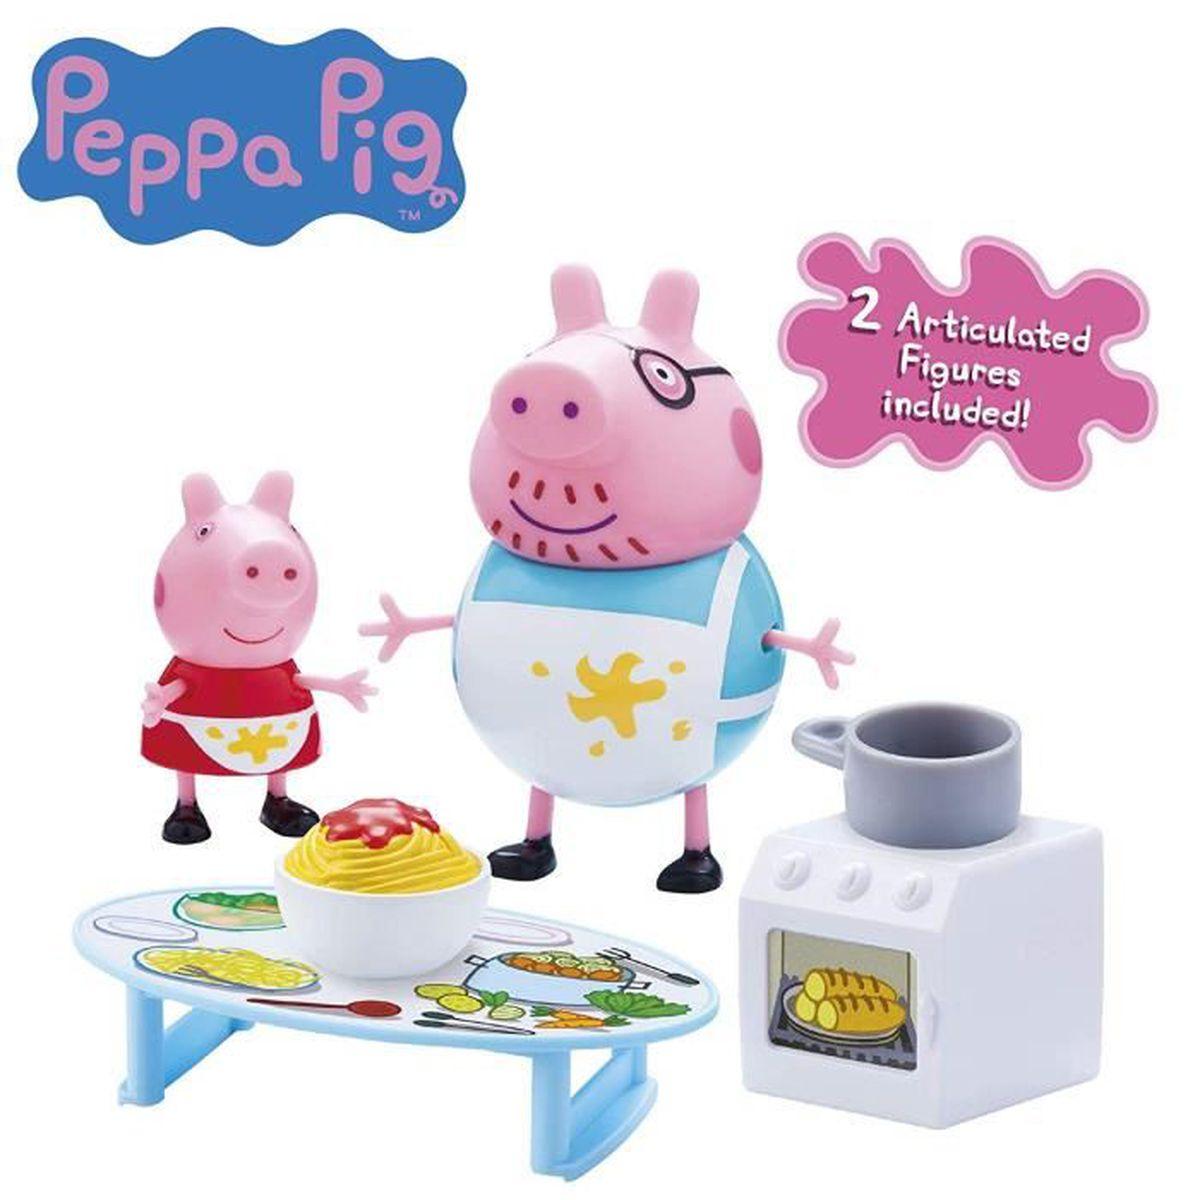 Peppa Pig Jeu De Cuisine Malpropre De Peppa Avec 2 Figurines Achat Vente Figurine Personnage Cdiscount